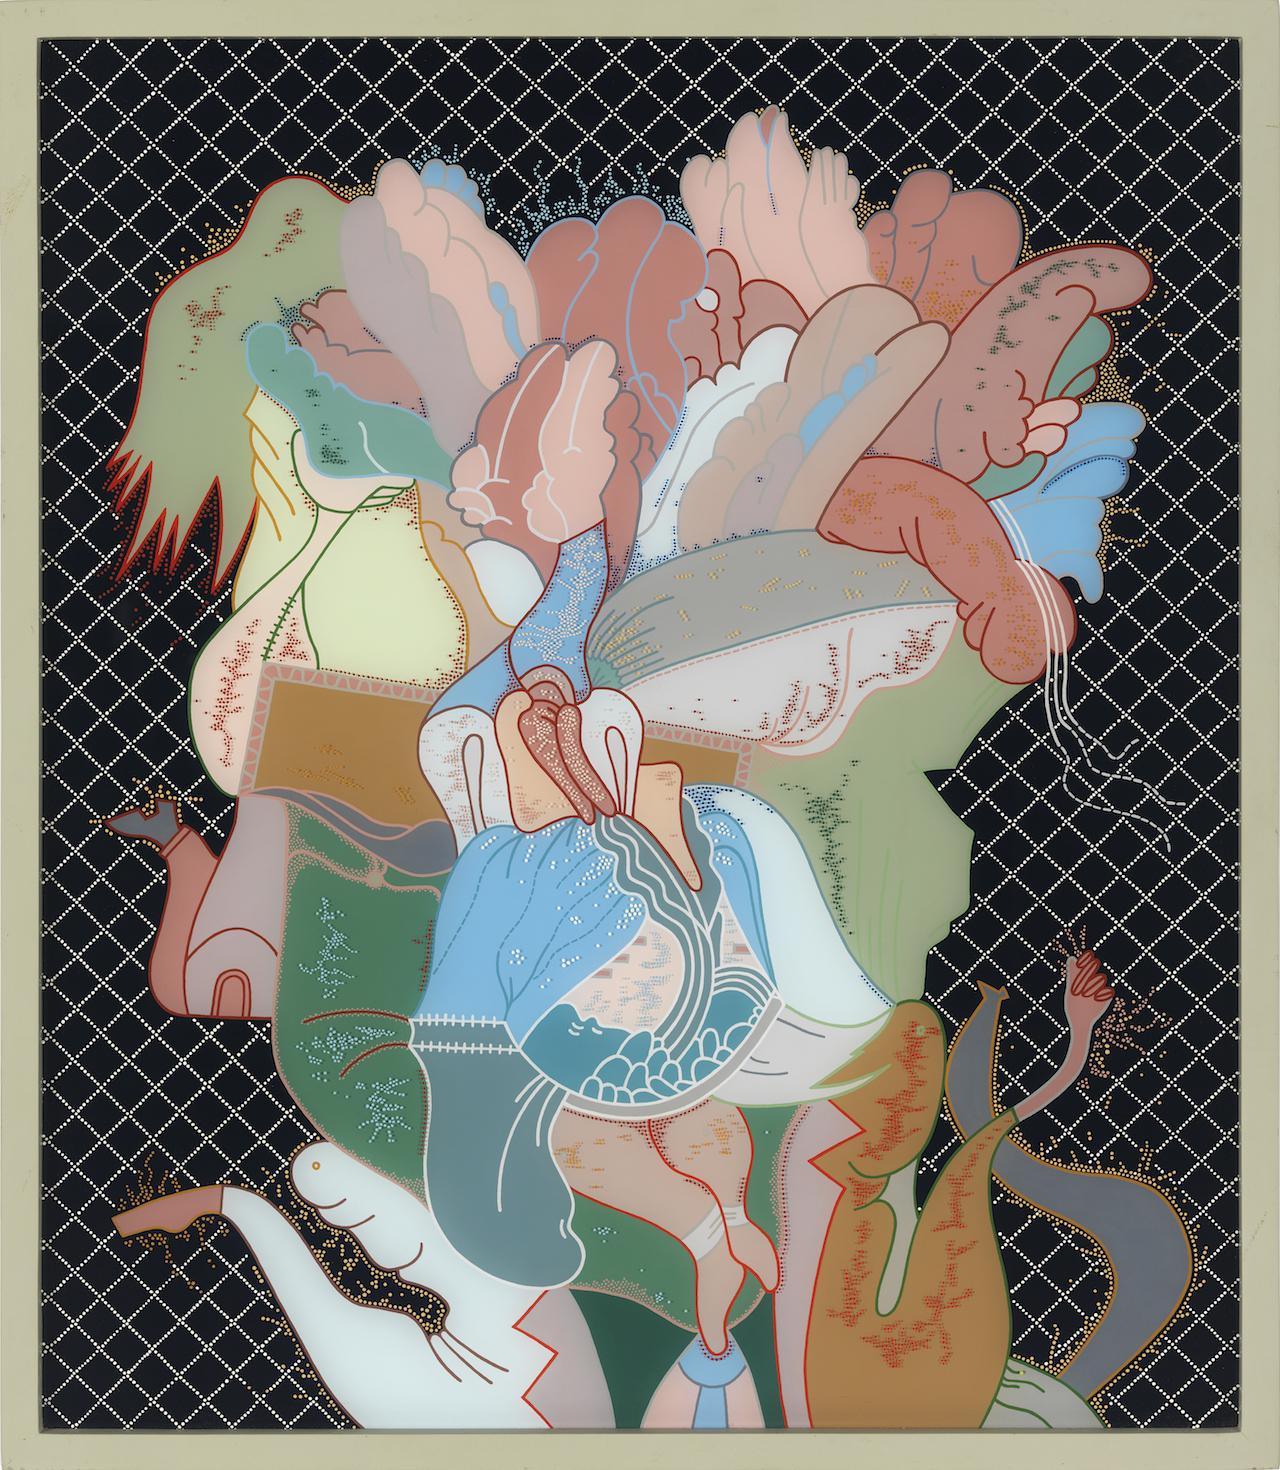 Poor Traits   Barbara Rossi DePaul Art Museum 935 W. Fullerton, Chicago, IL 60614 May 12, 2016 - August 21, 2016